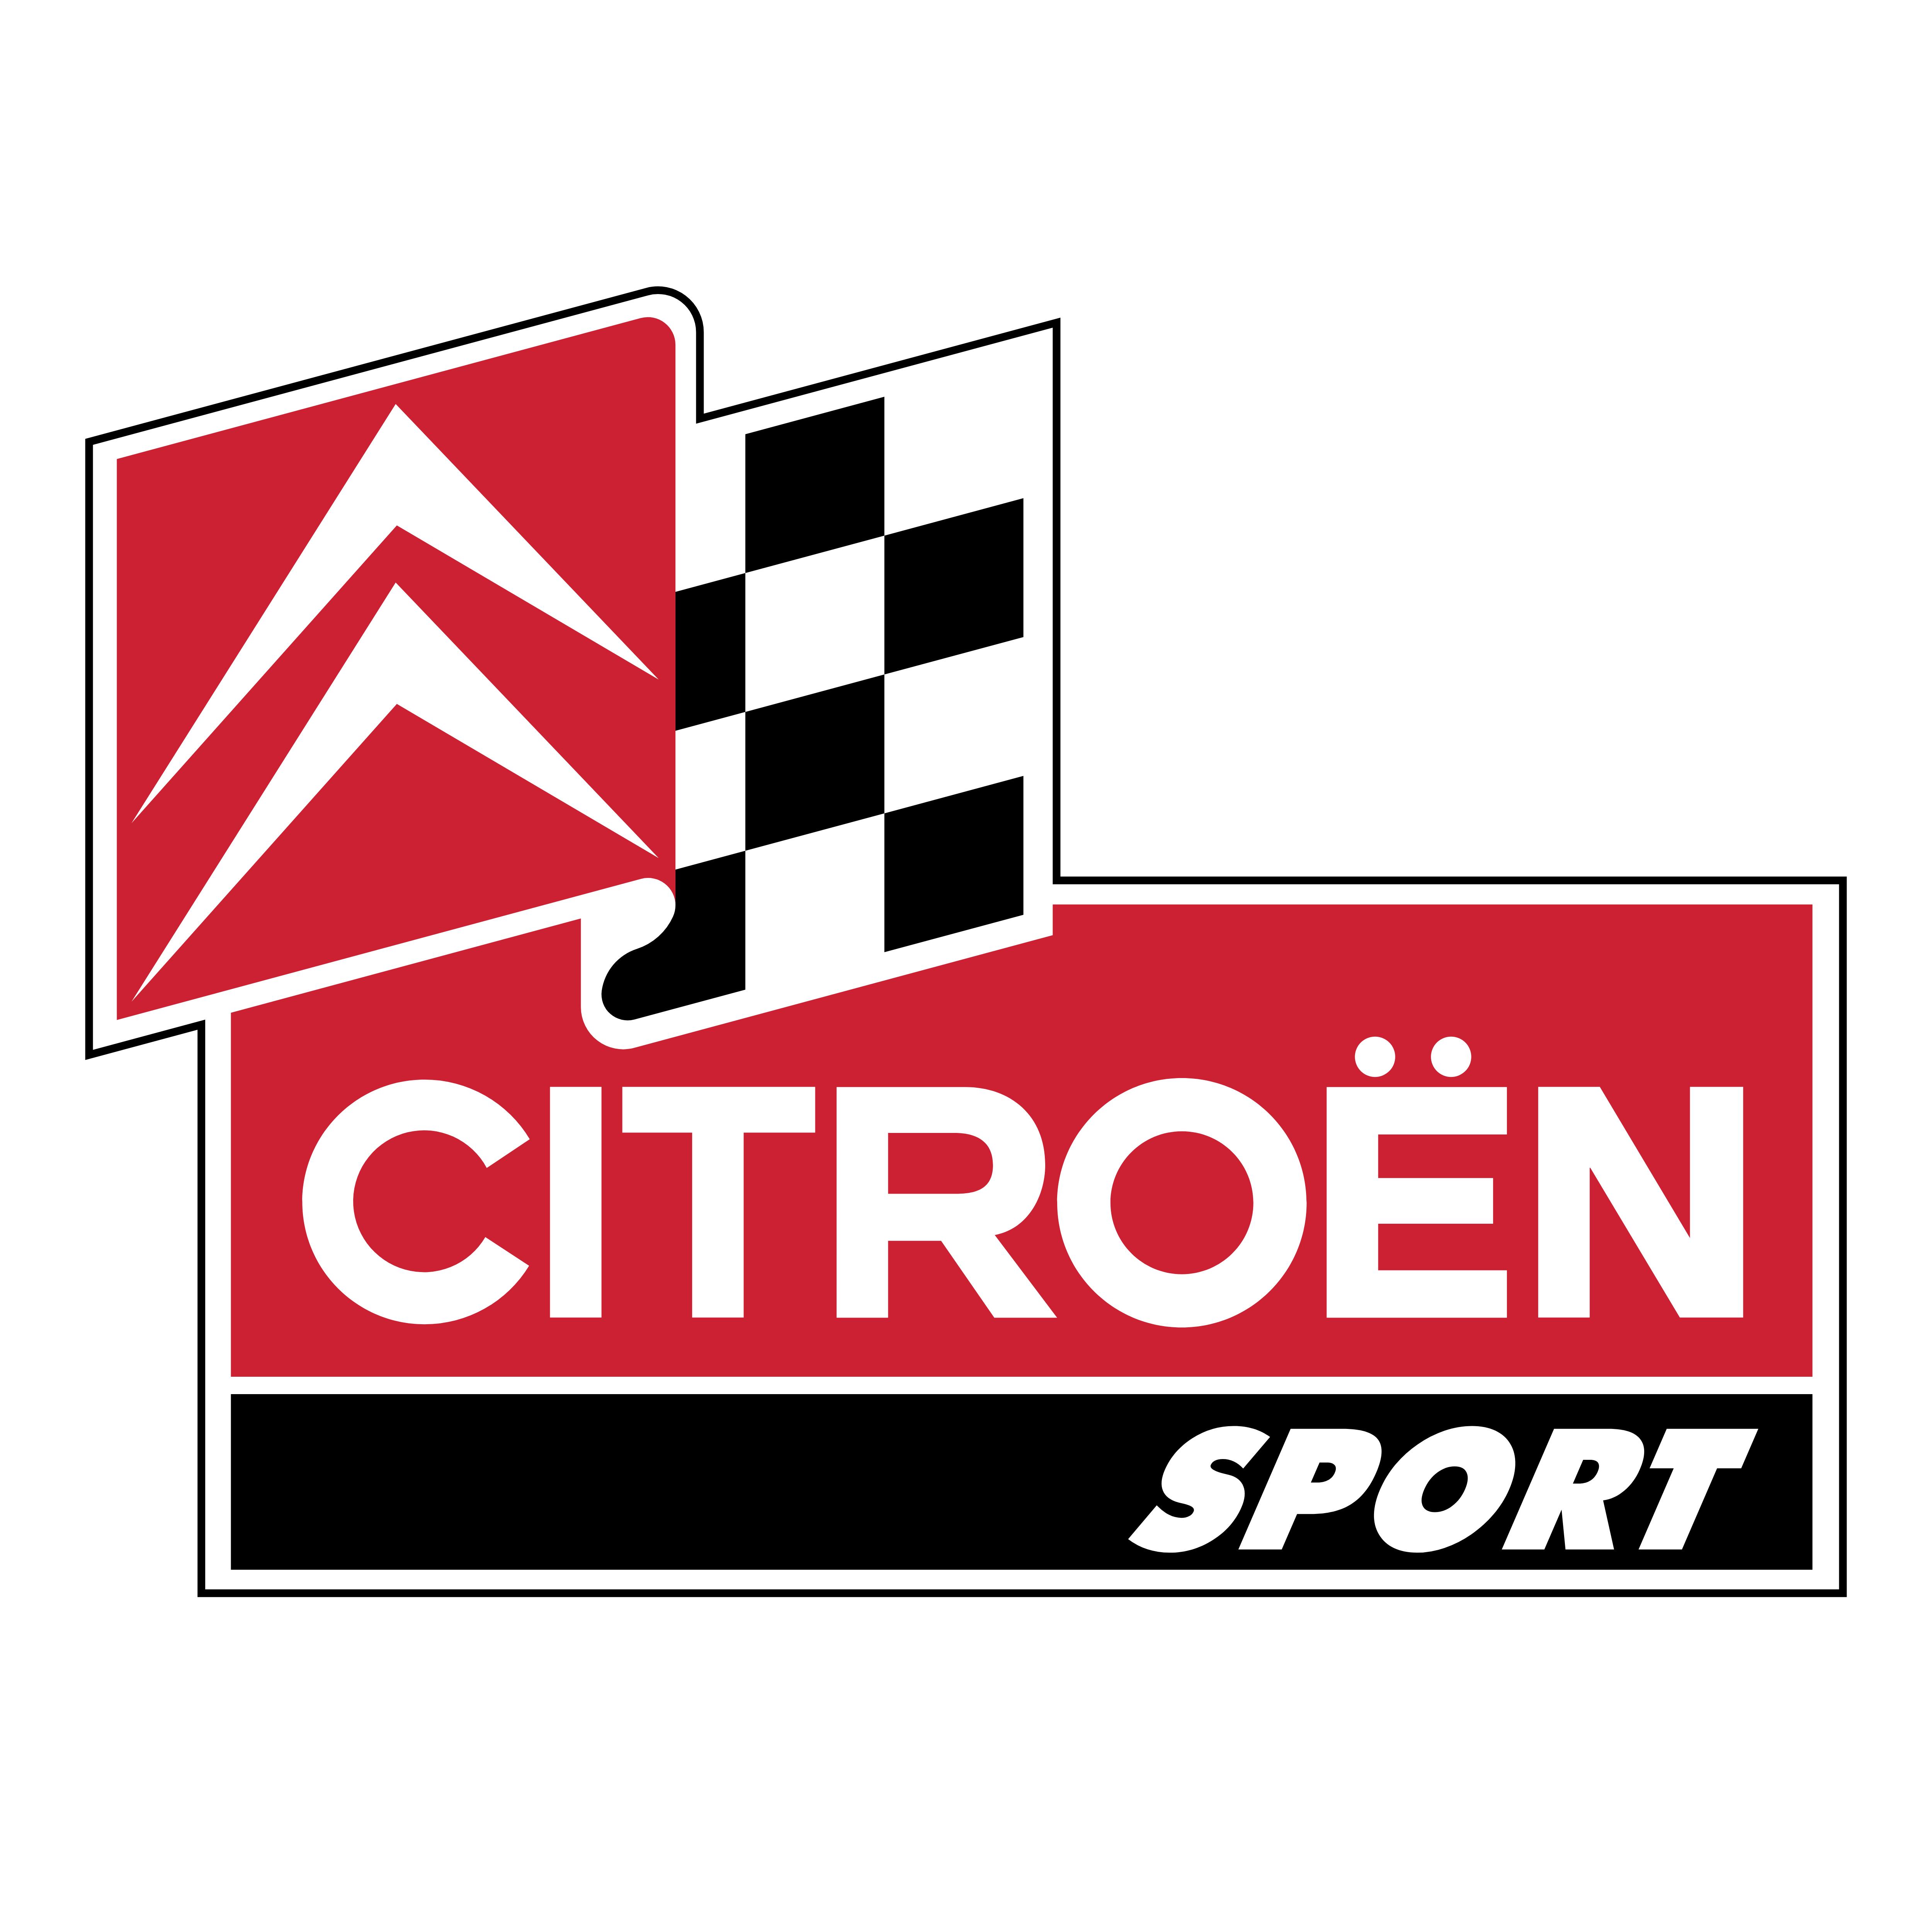 Citroen Logos Download